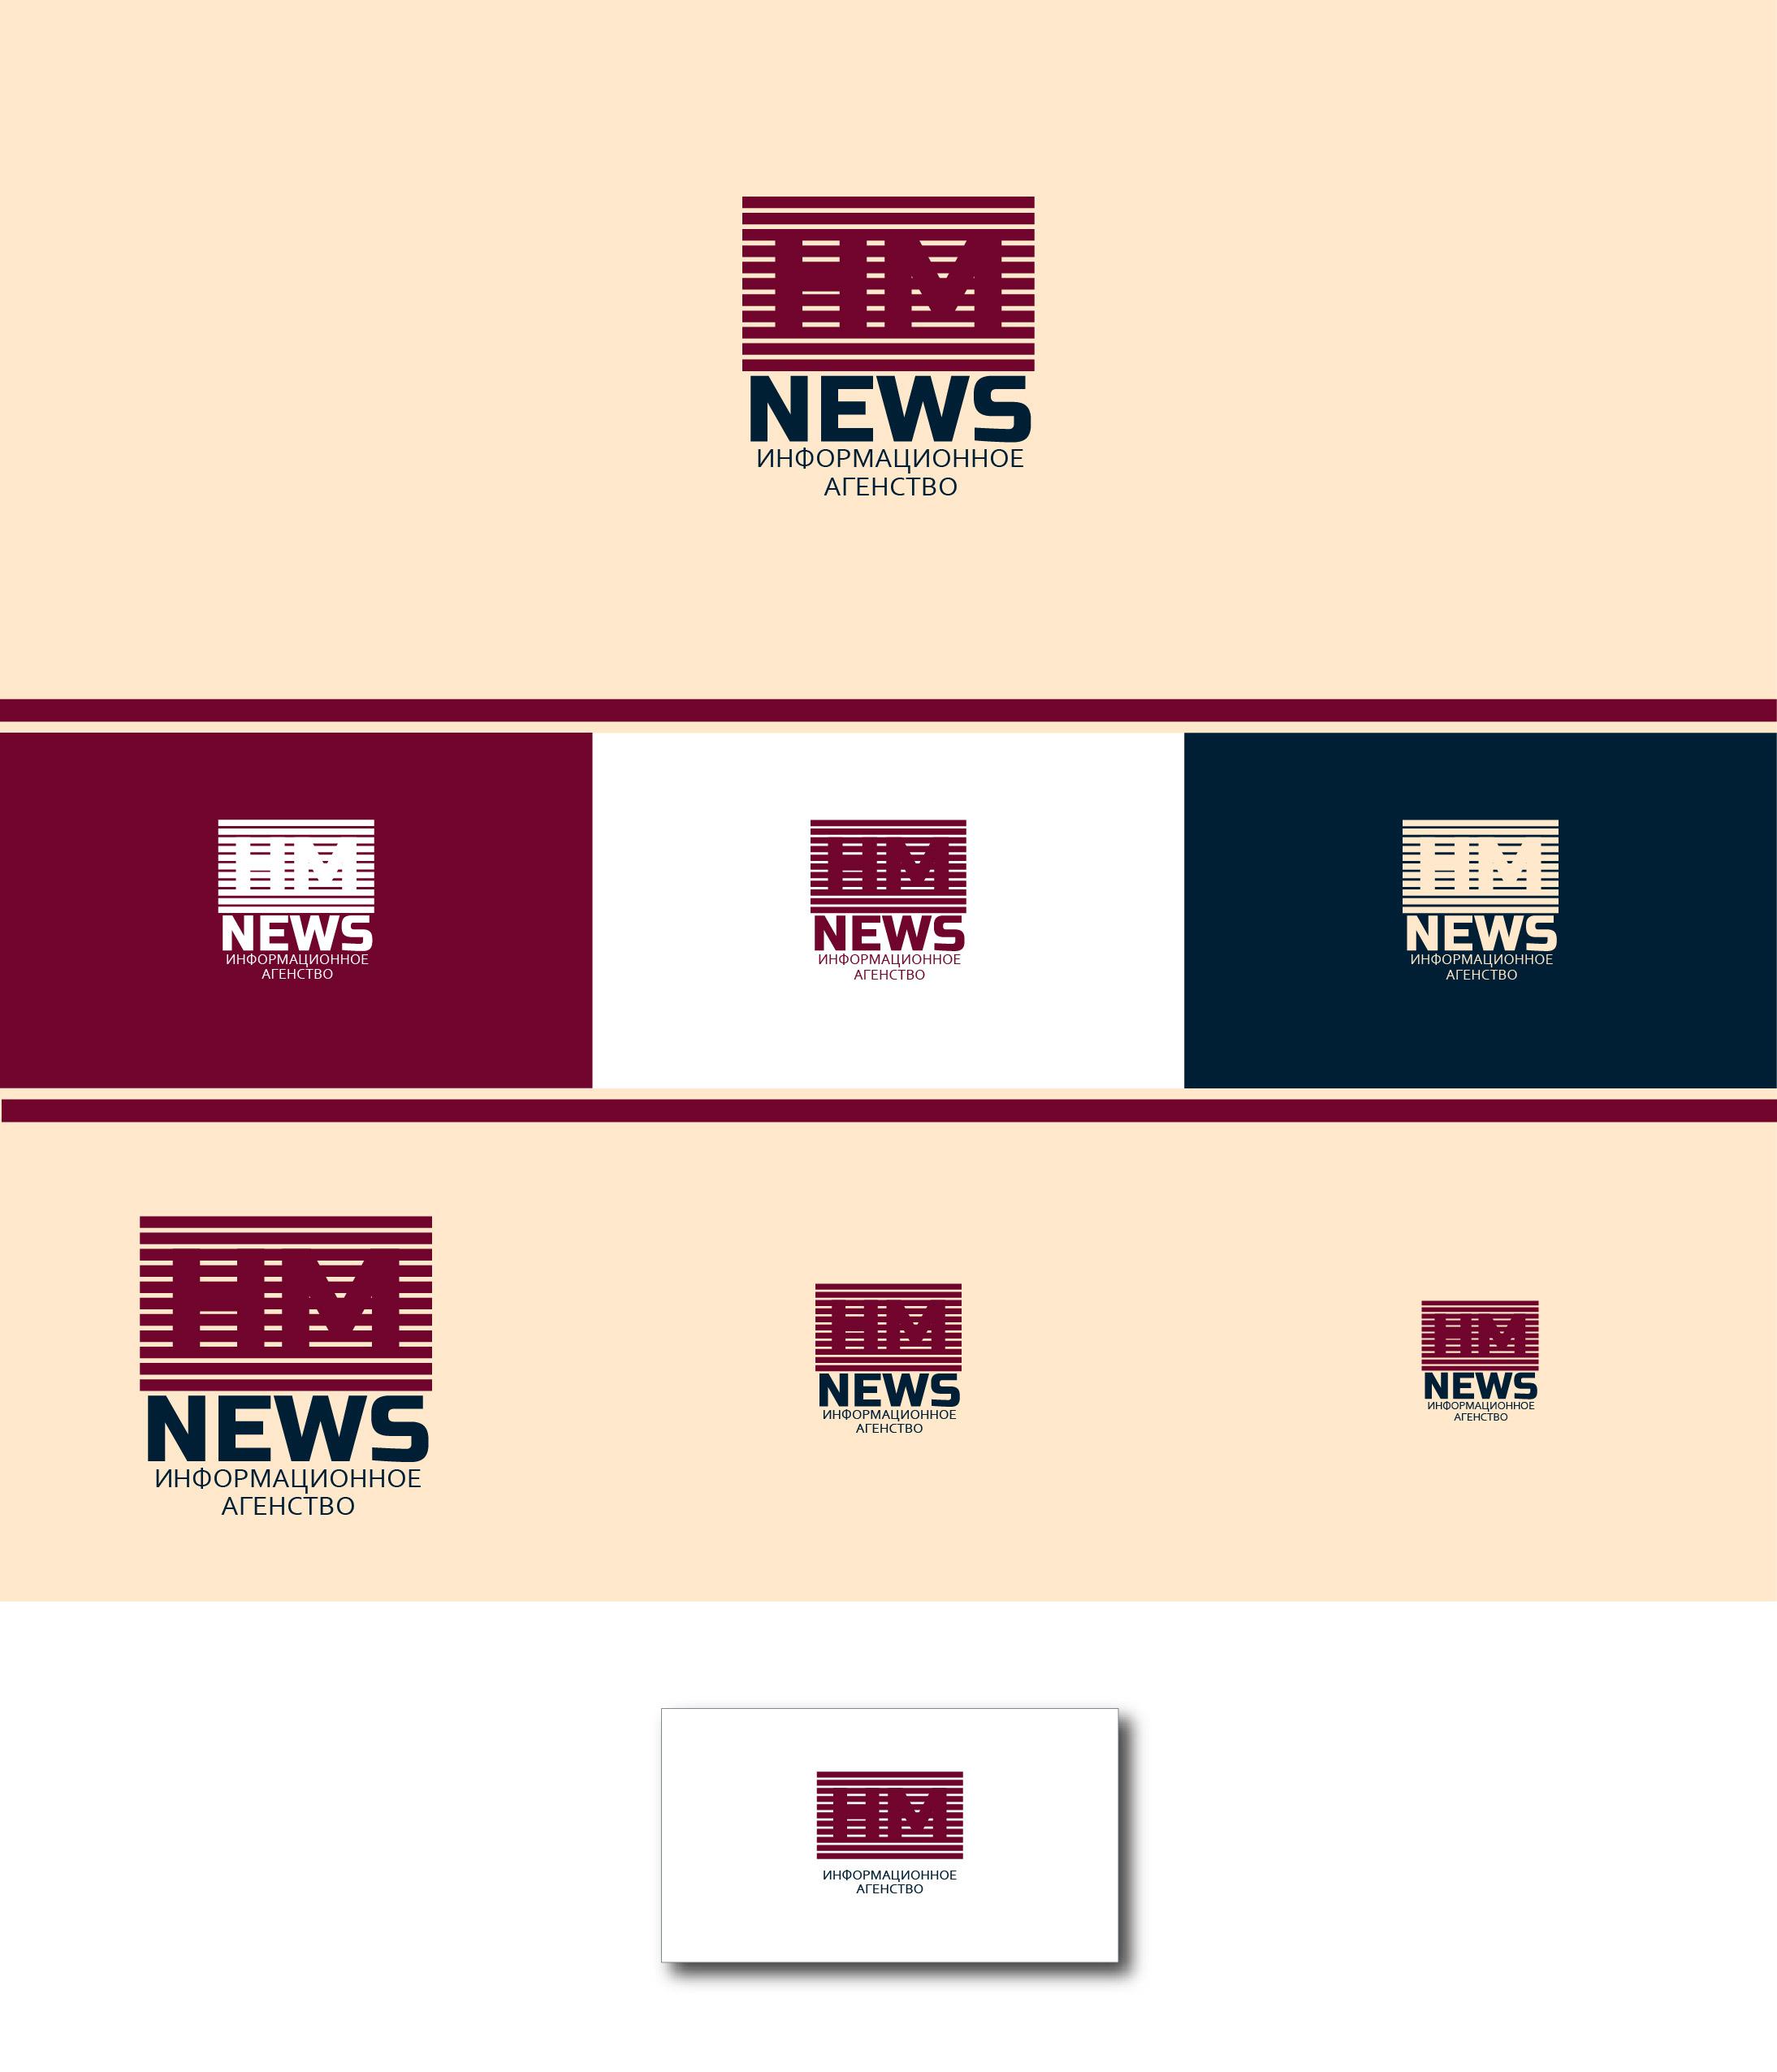 Логотип для информационного агентства фото f_9635aa75b674e3ed.jpg